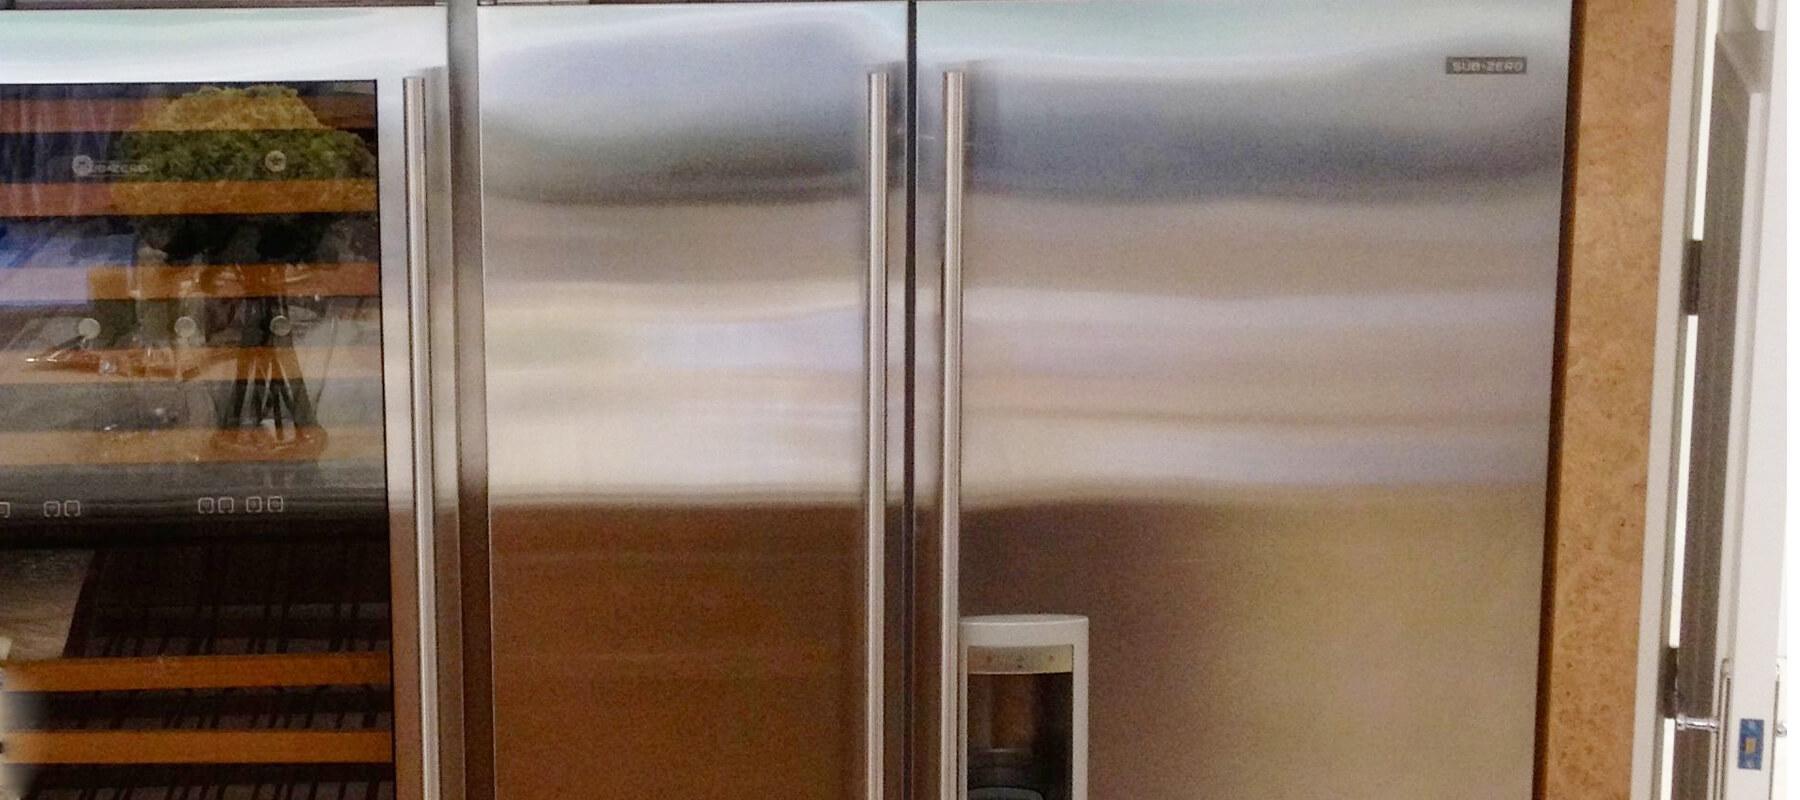 Built in Wine Refrigerator Beverly Hills | Built-in Refrigerator Repair